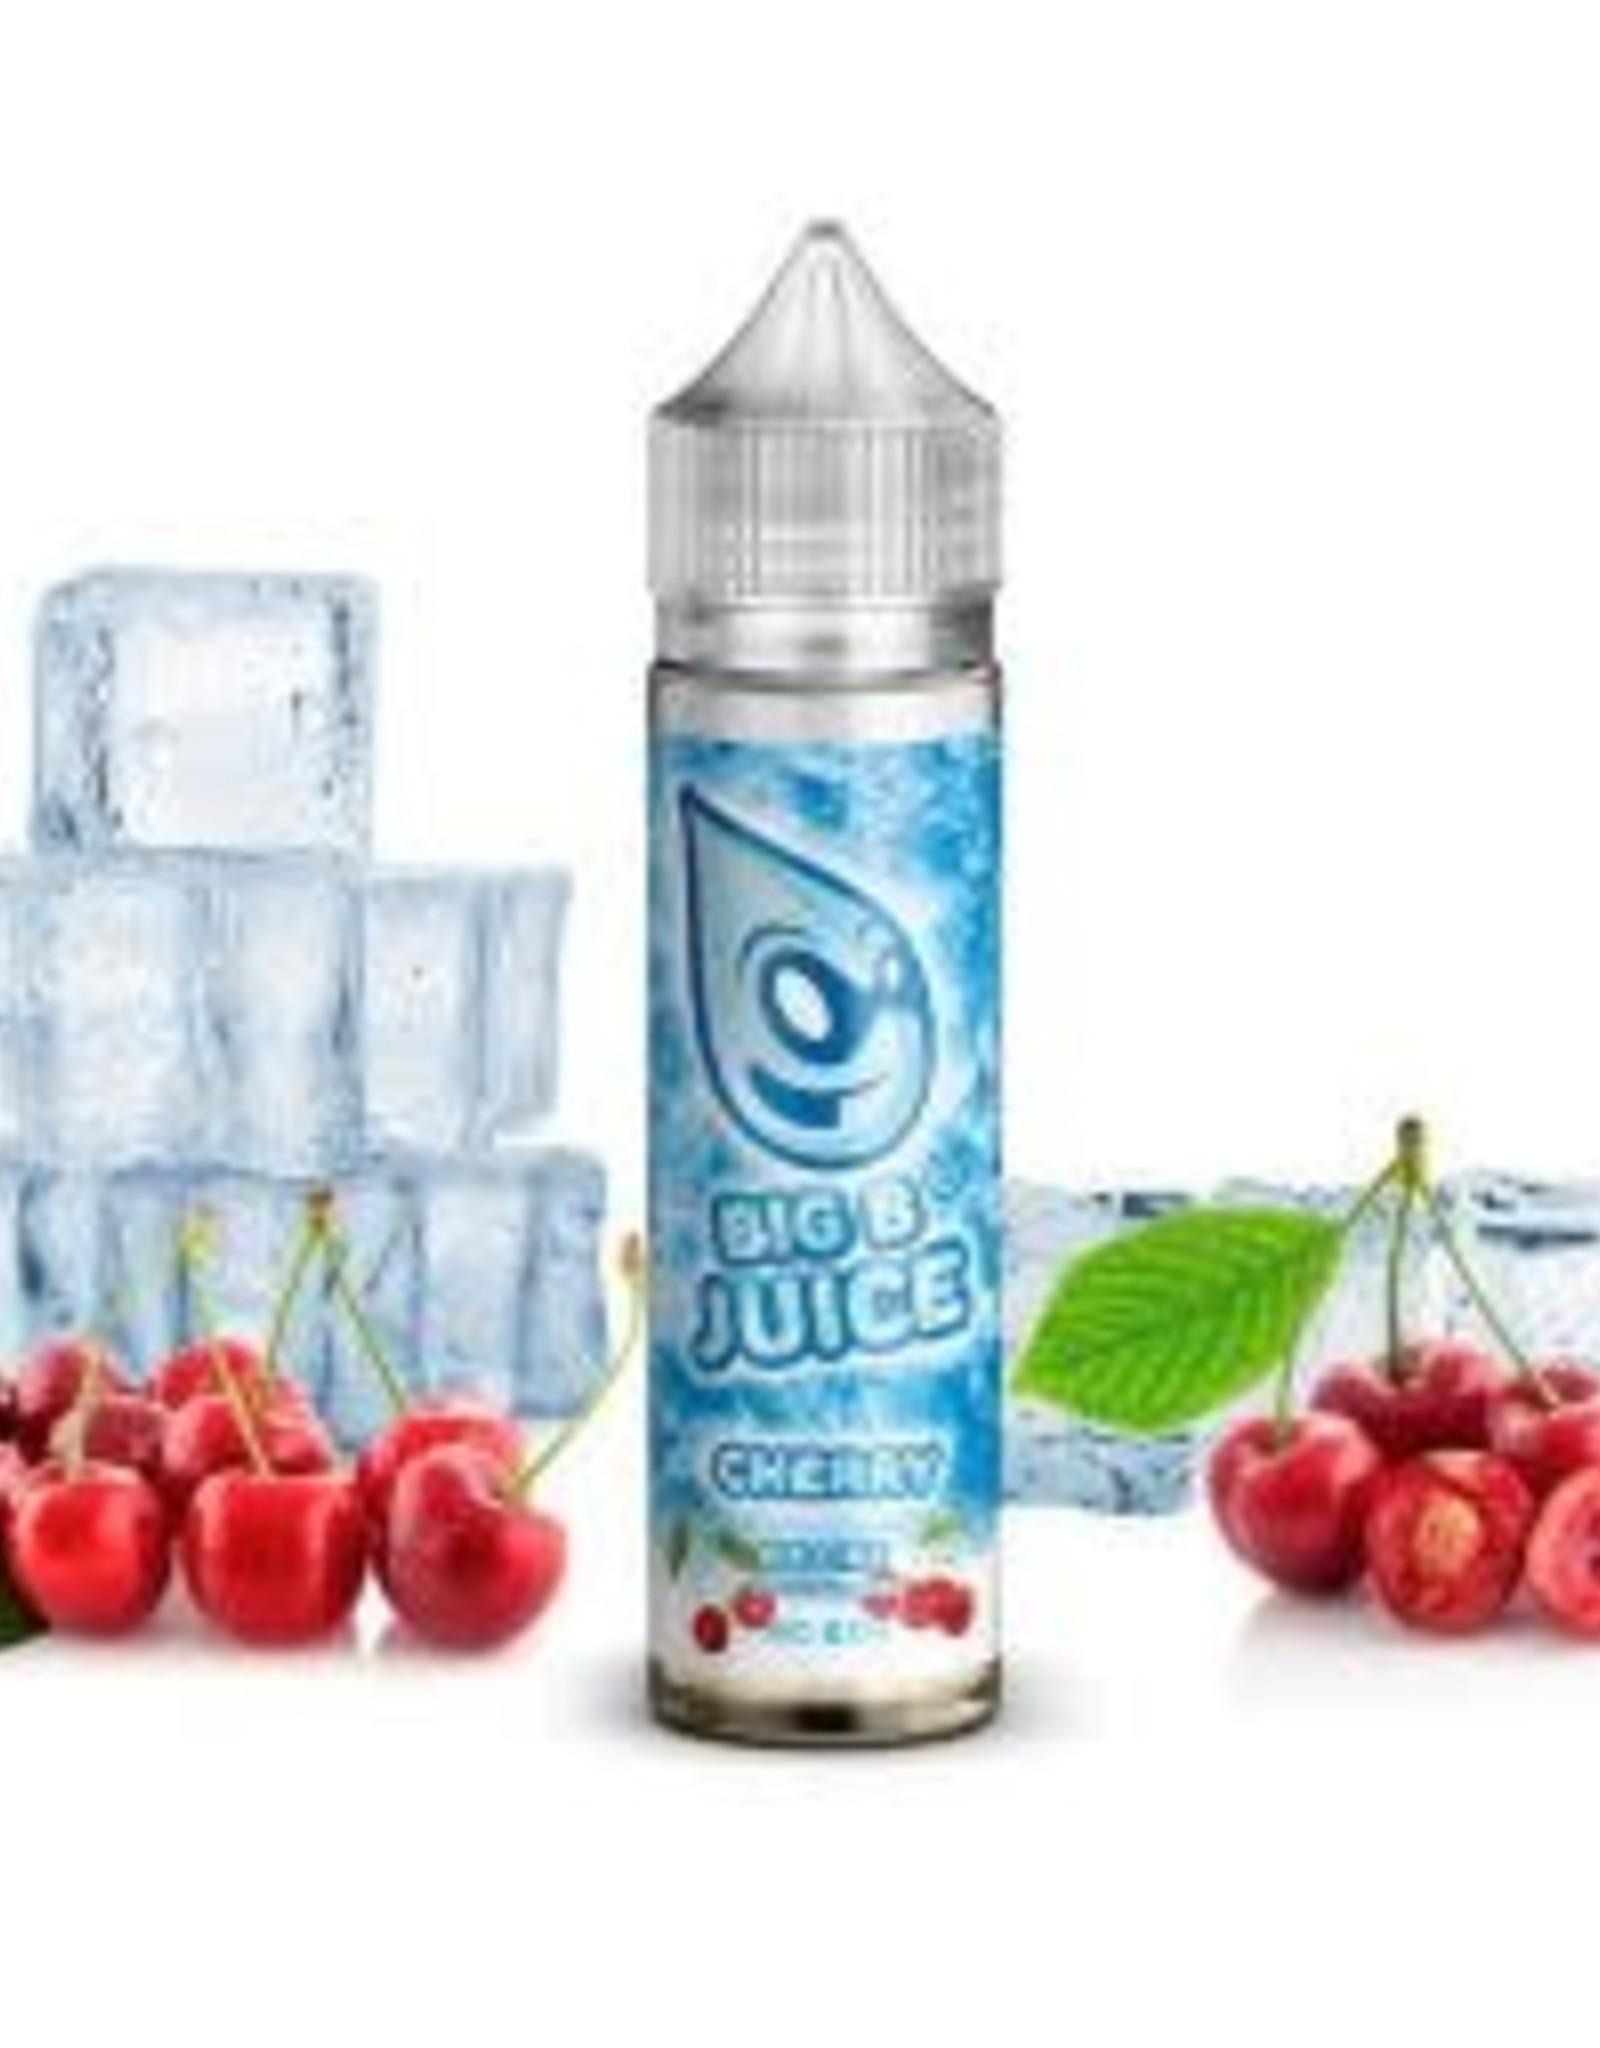 Big-B Big-B - Cherry Ice 50ml